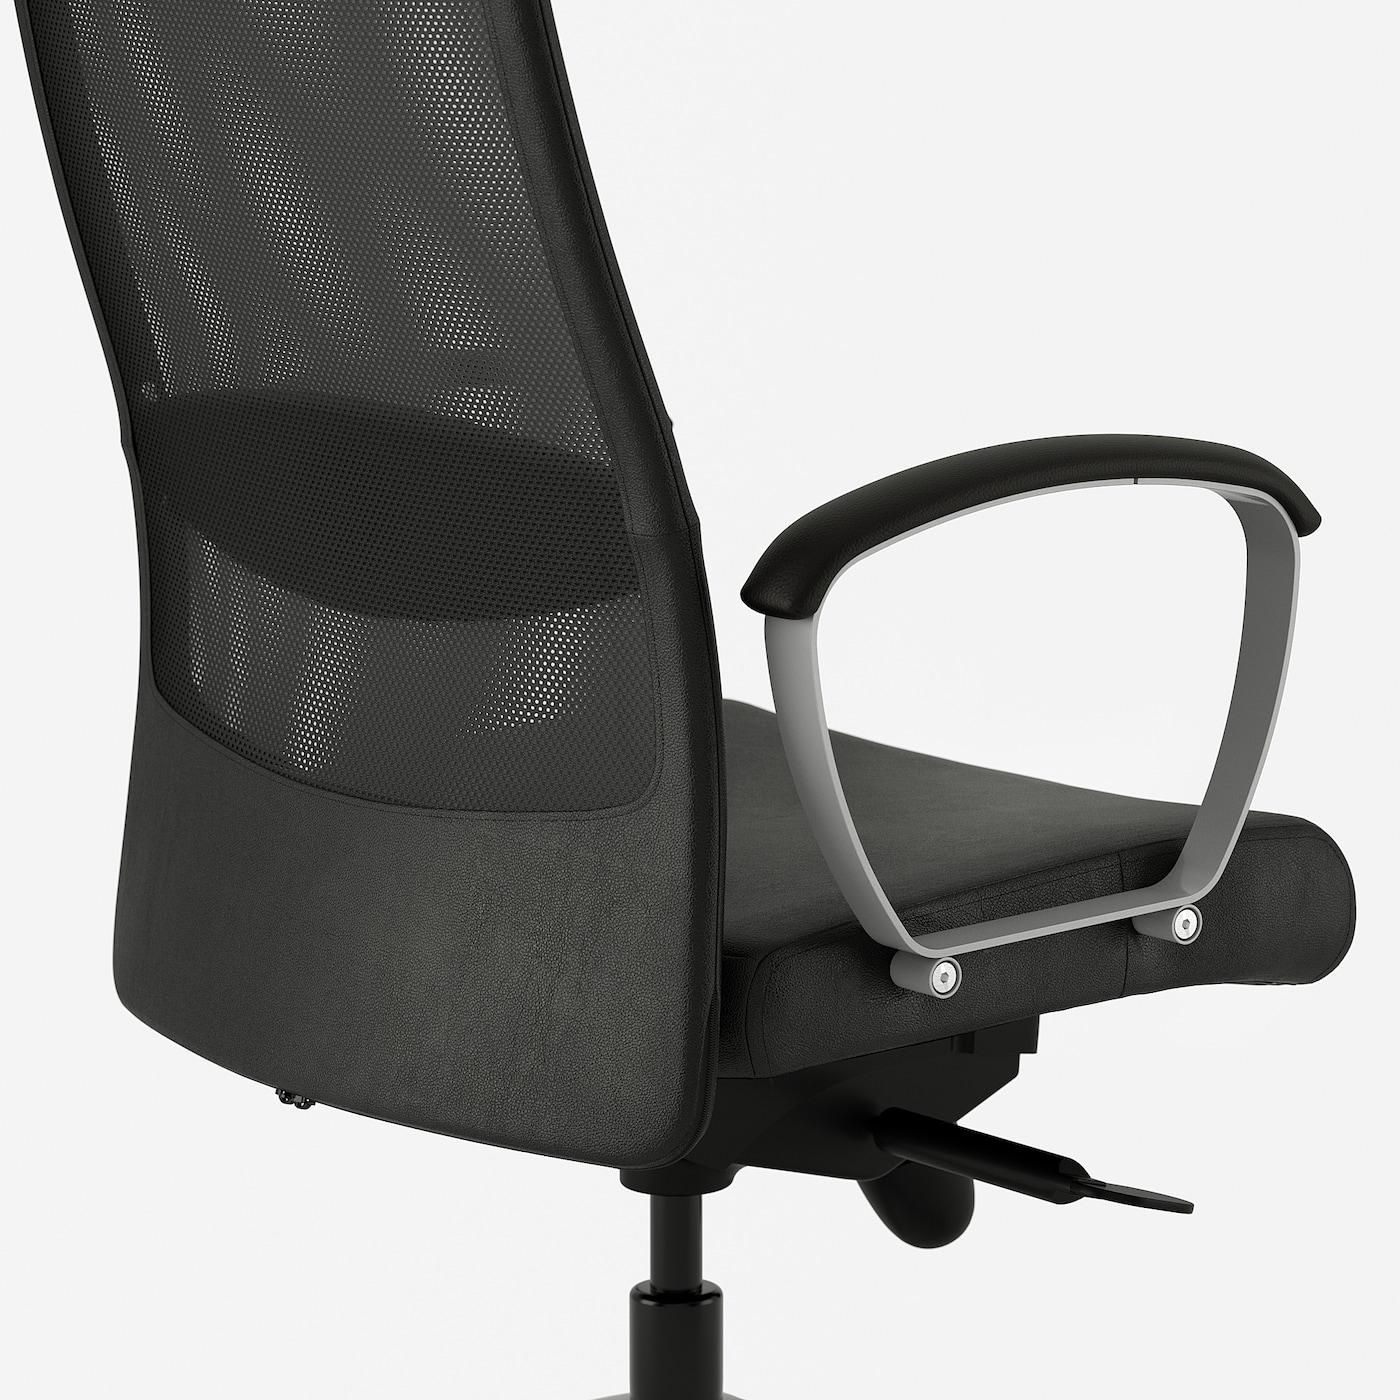 MARKUS office chair Glose black 110 kg 62 cm 60 cm 129 cm 140 cm 53 cm 47 cm 46 cm 57 cm